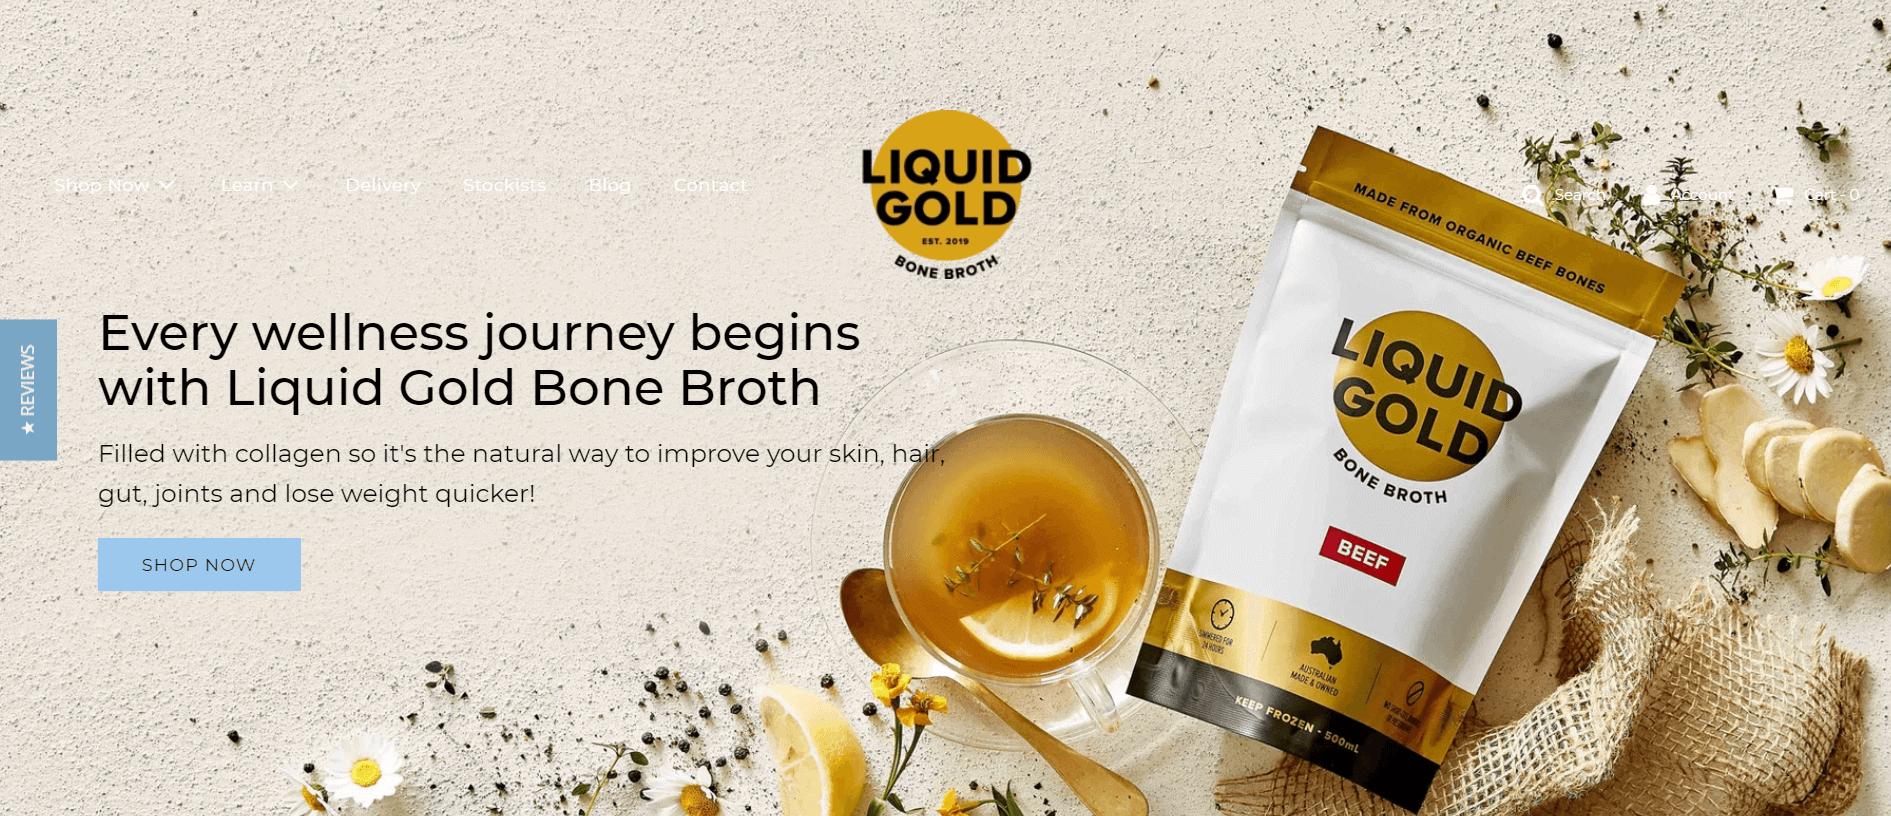 liquid gold bone broth